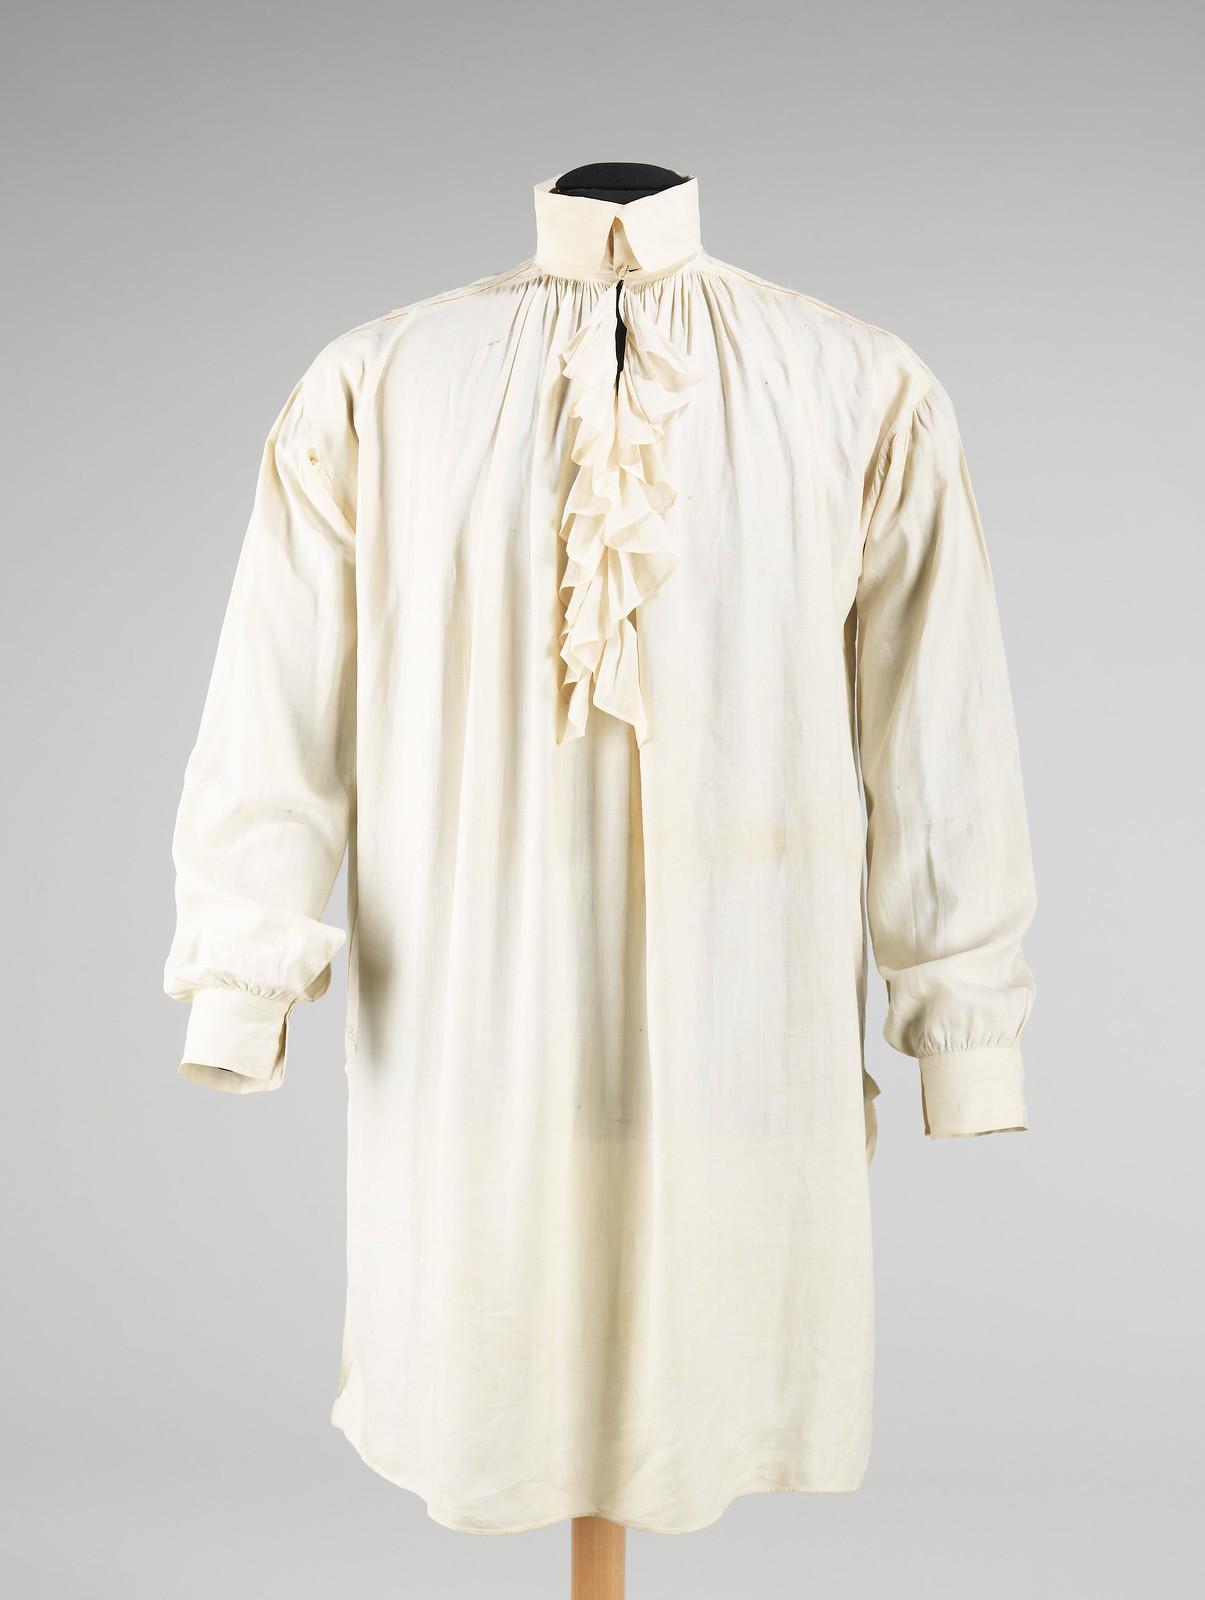 1816. Shirt. American. Linen. metmusem